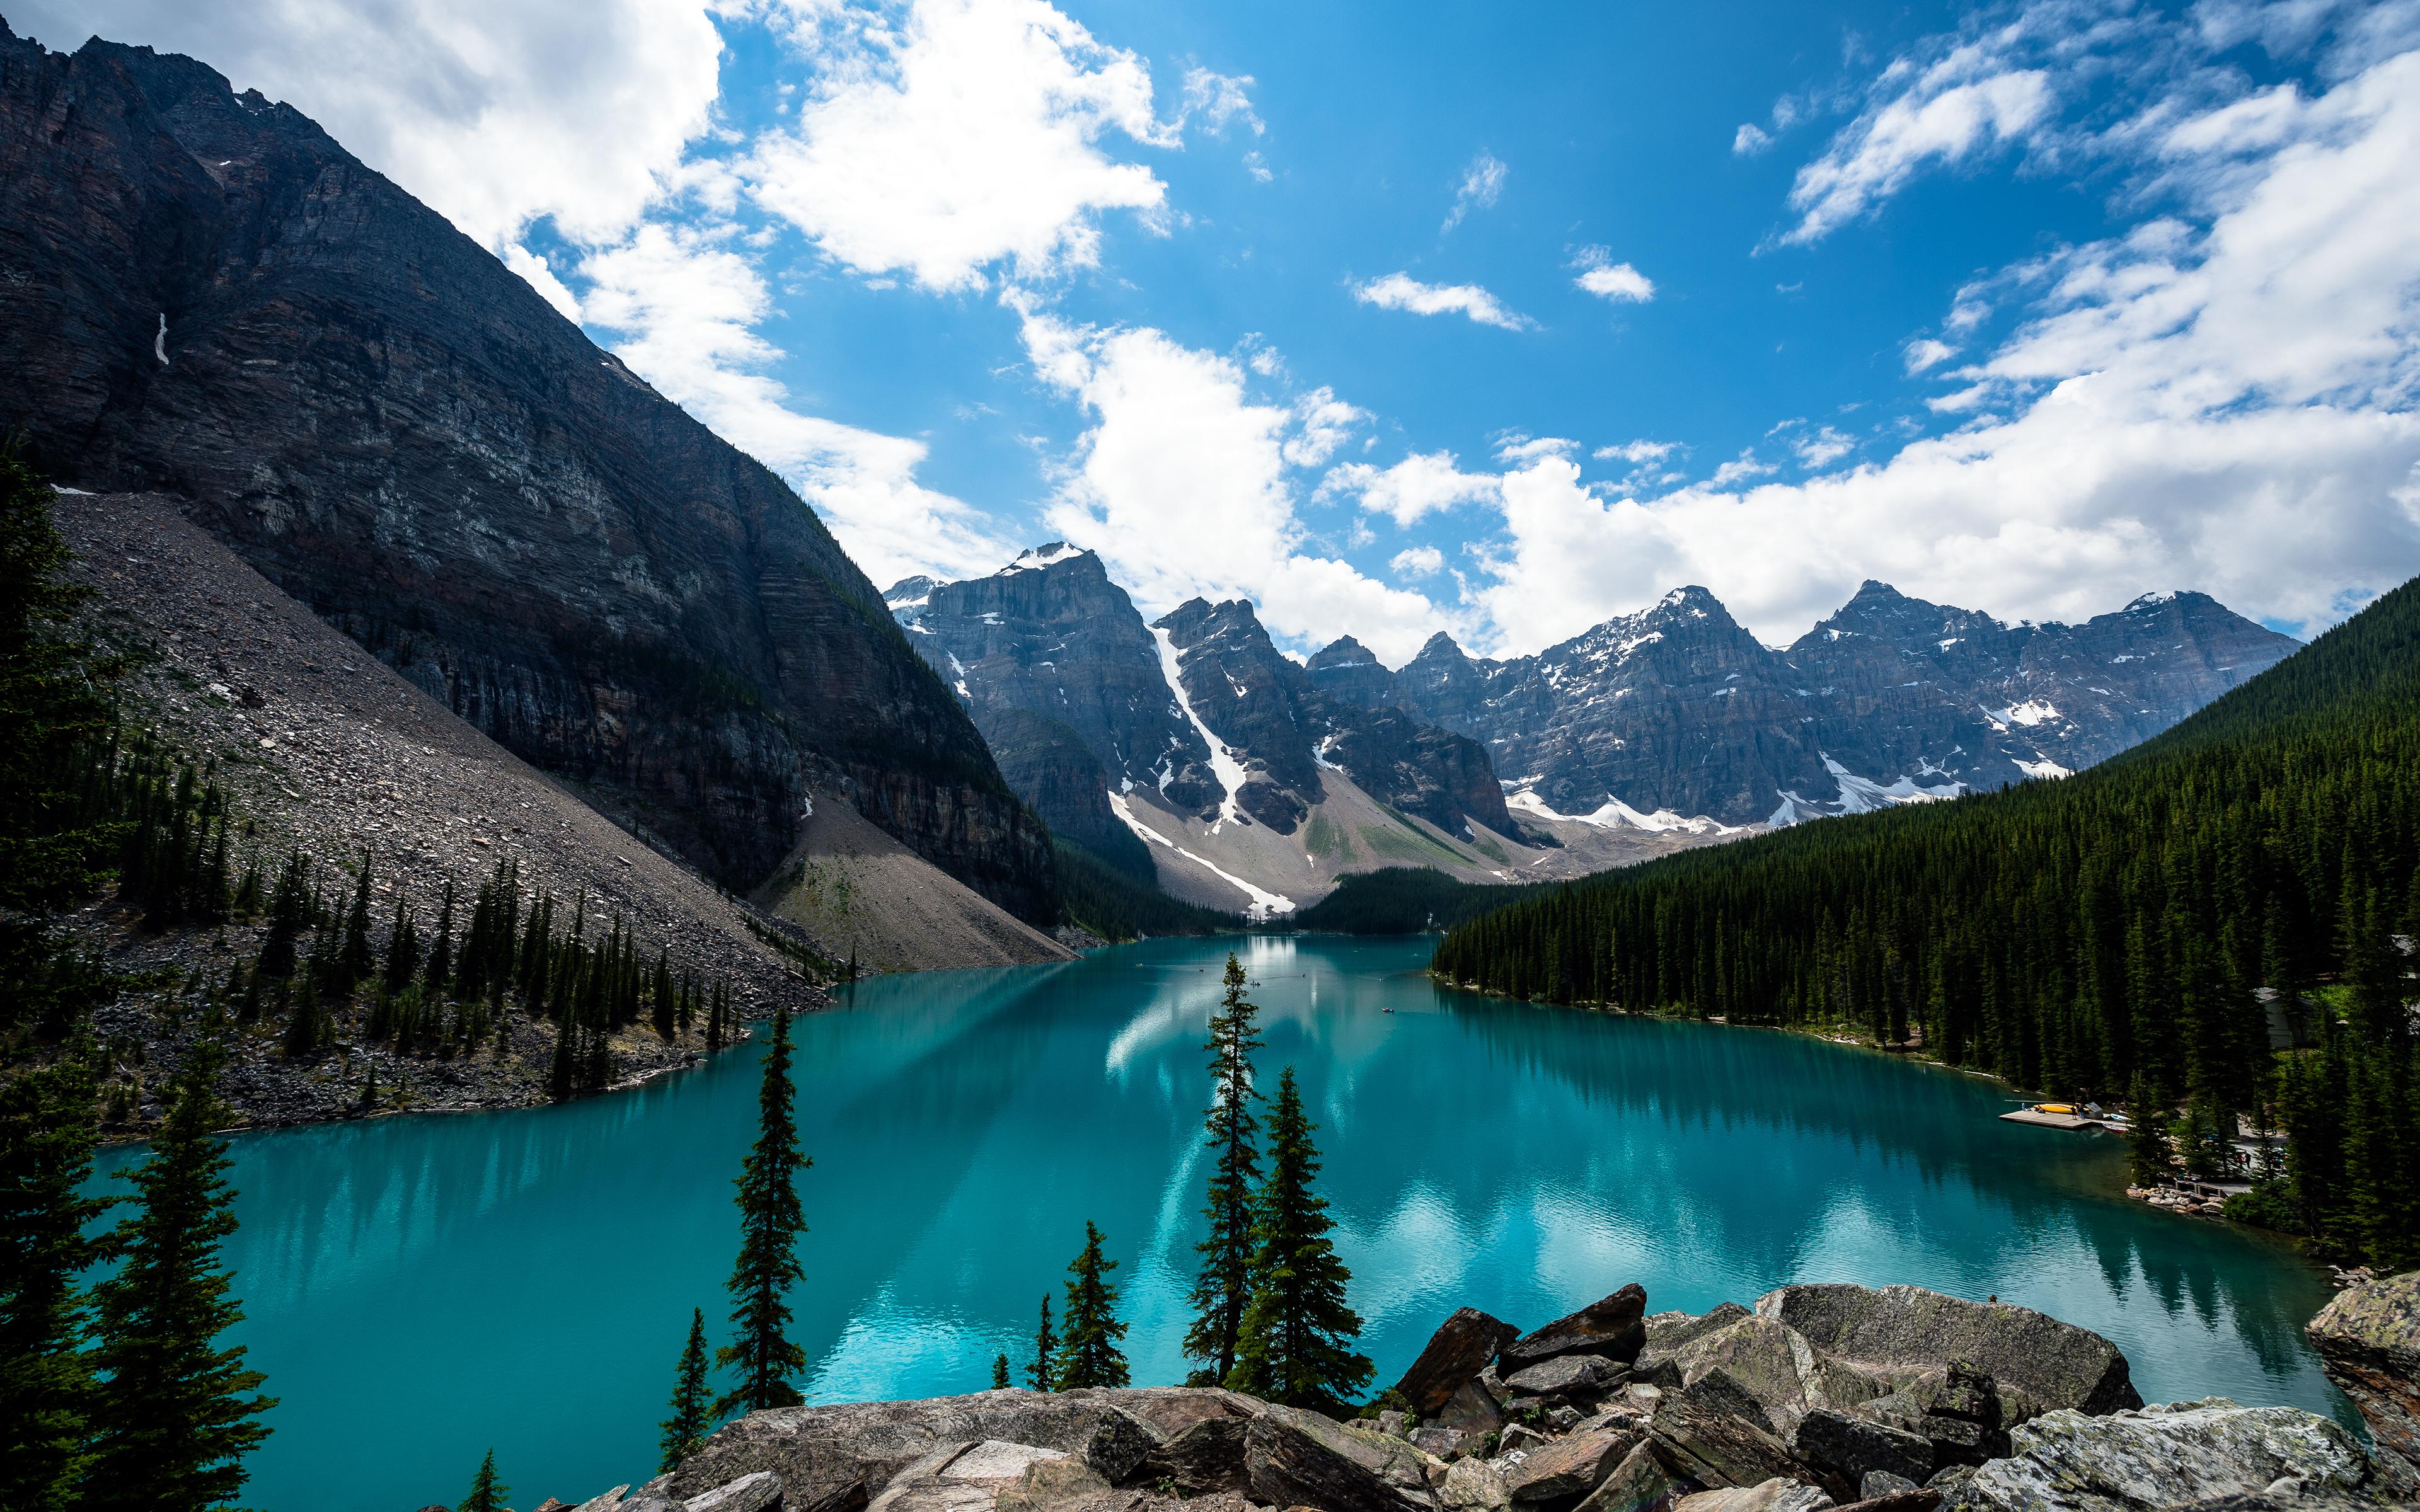 Victoria Glacier, Lake Louise, Banff National Park, Alberta, Canada  № 193104  скачать